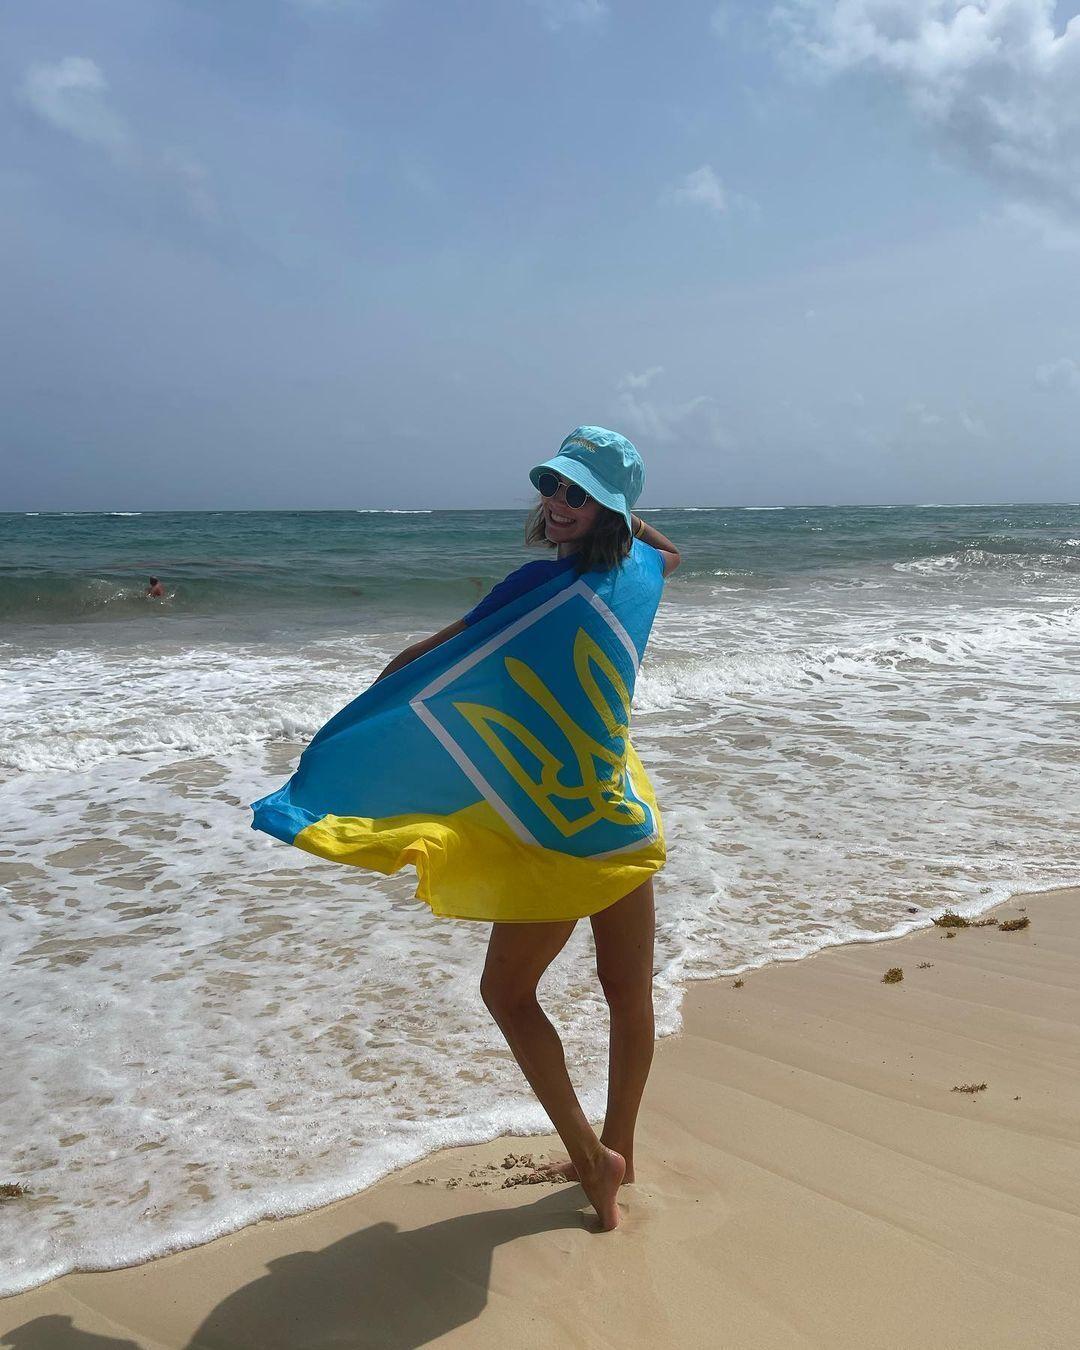 Марта Федина поздравила Украину с 30-летием